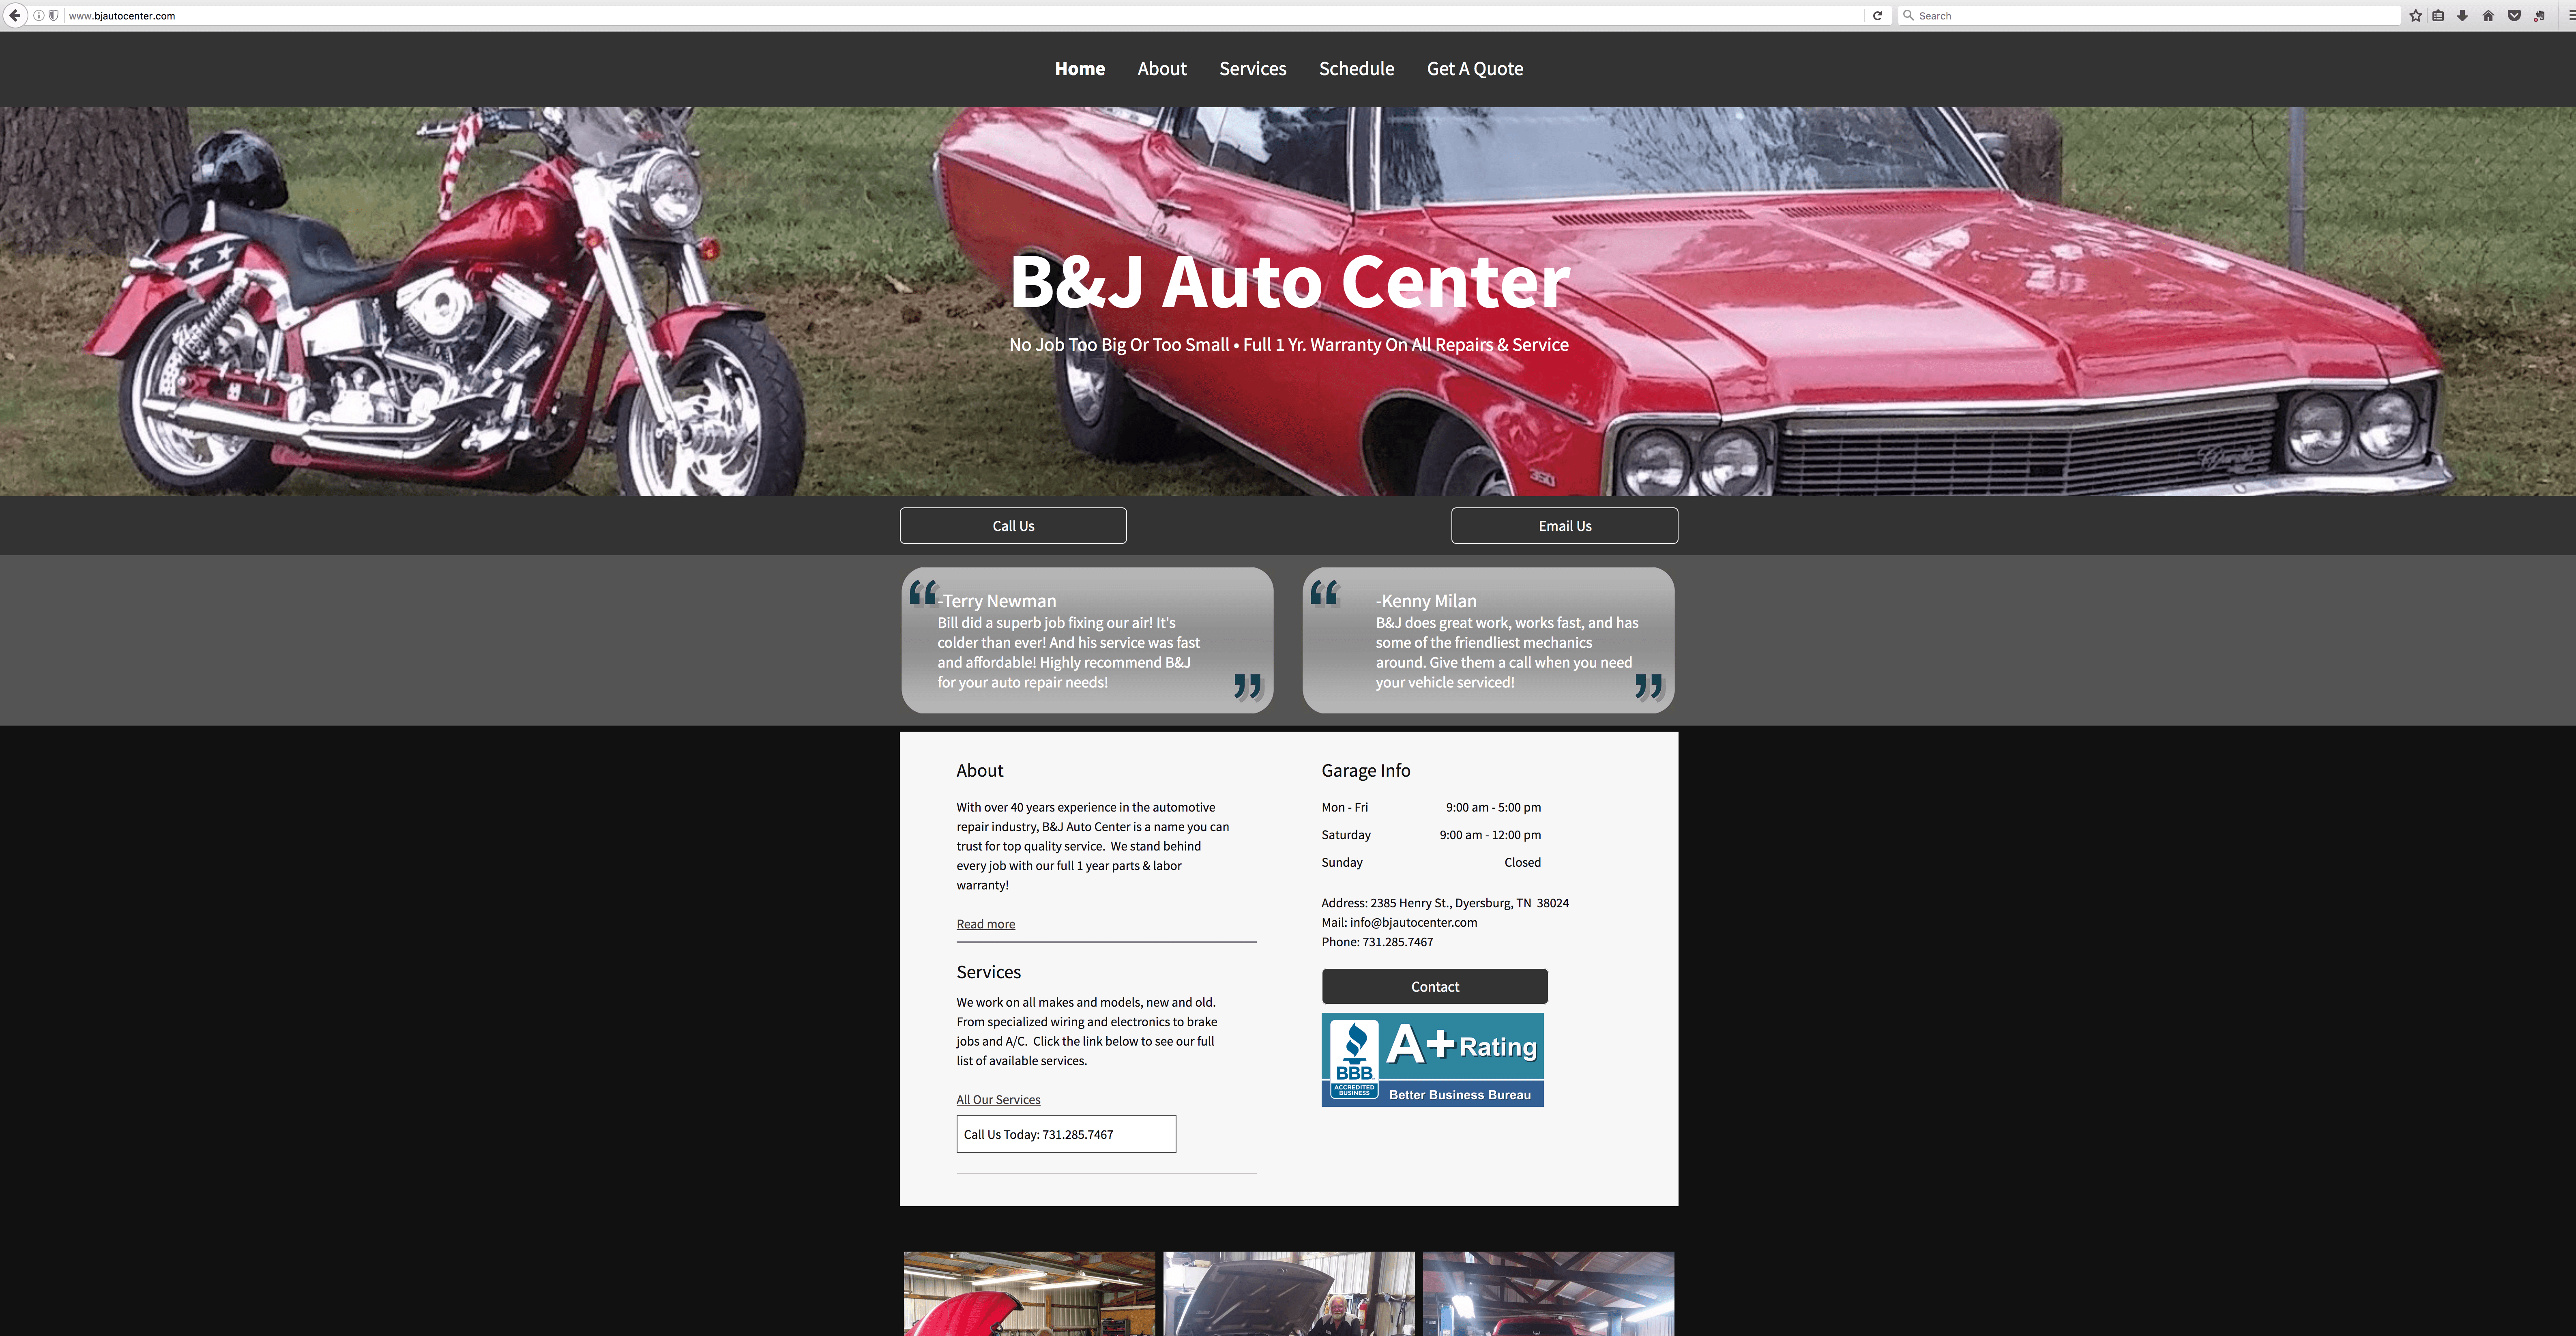 B&J Auto Center